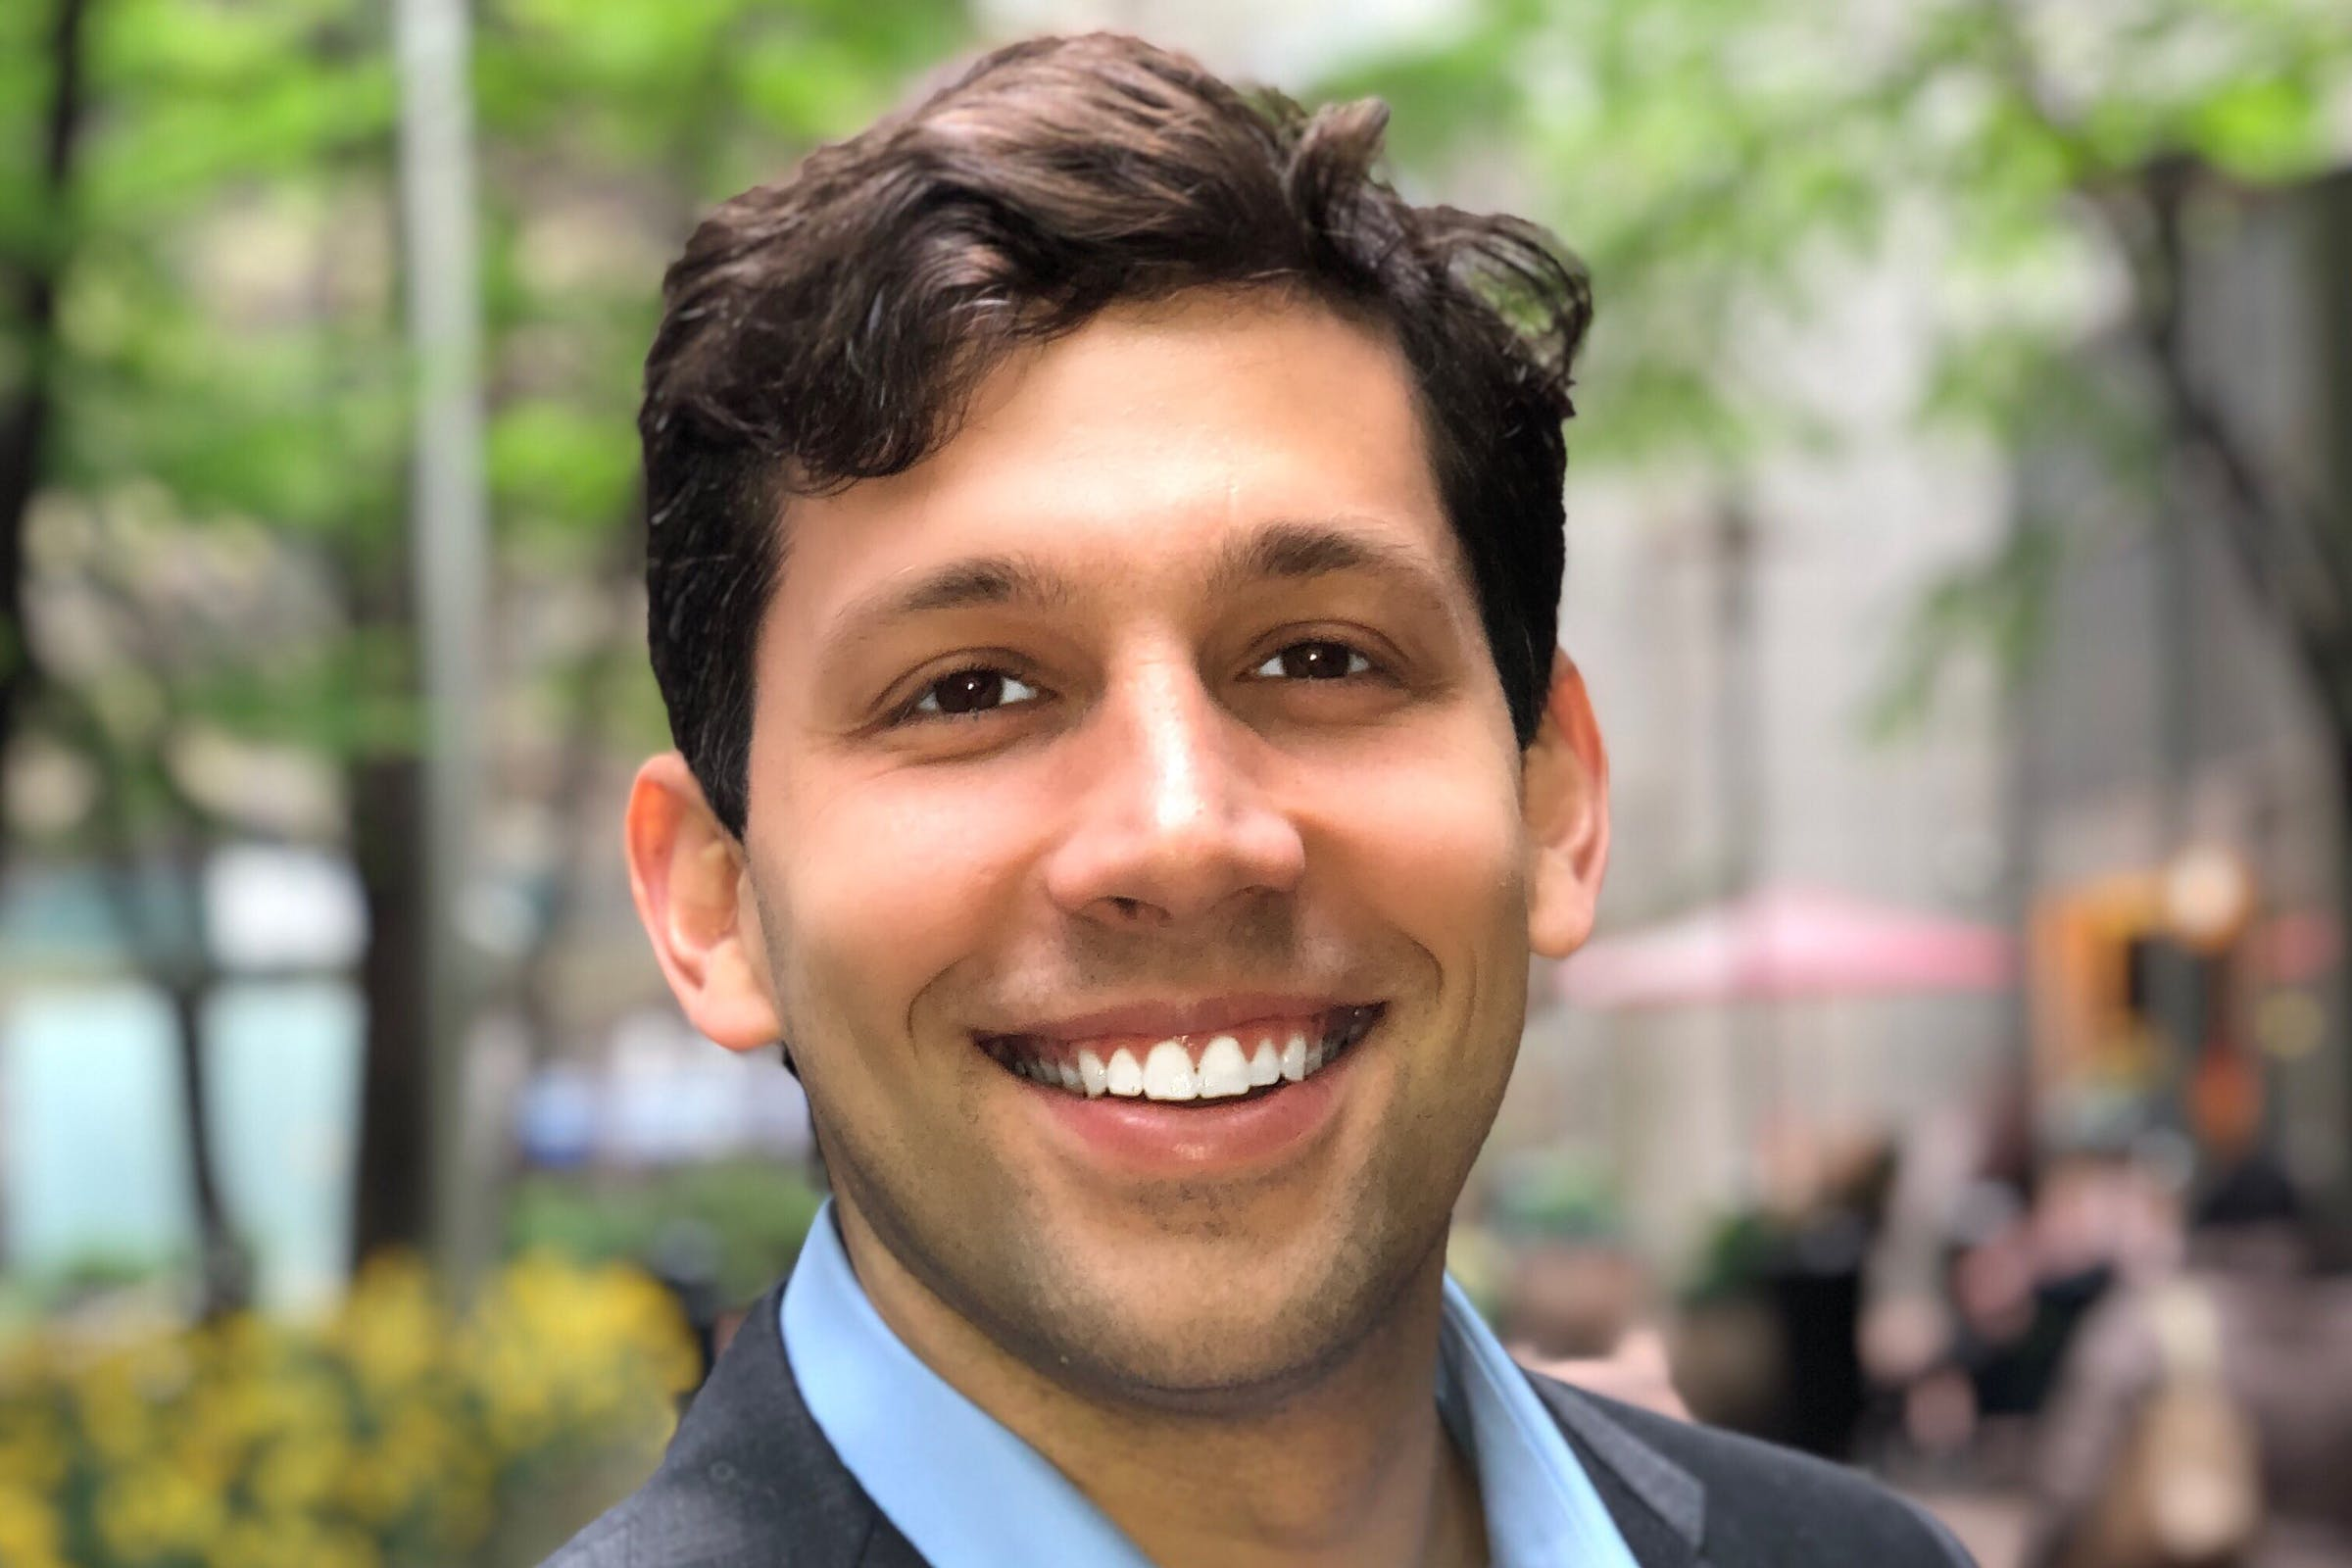 Headshot of Givz founder, Andrew Forman